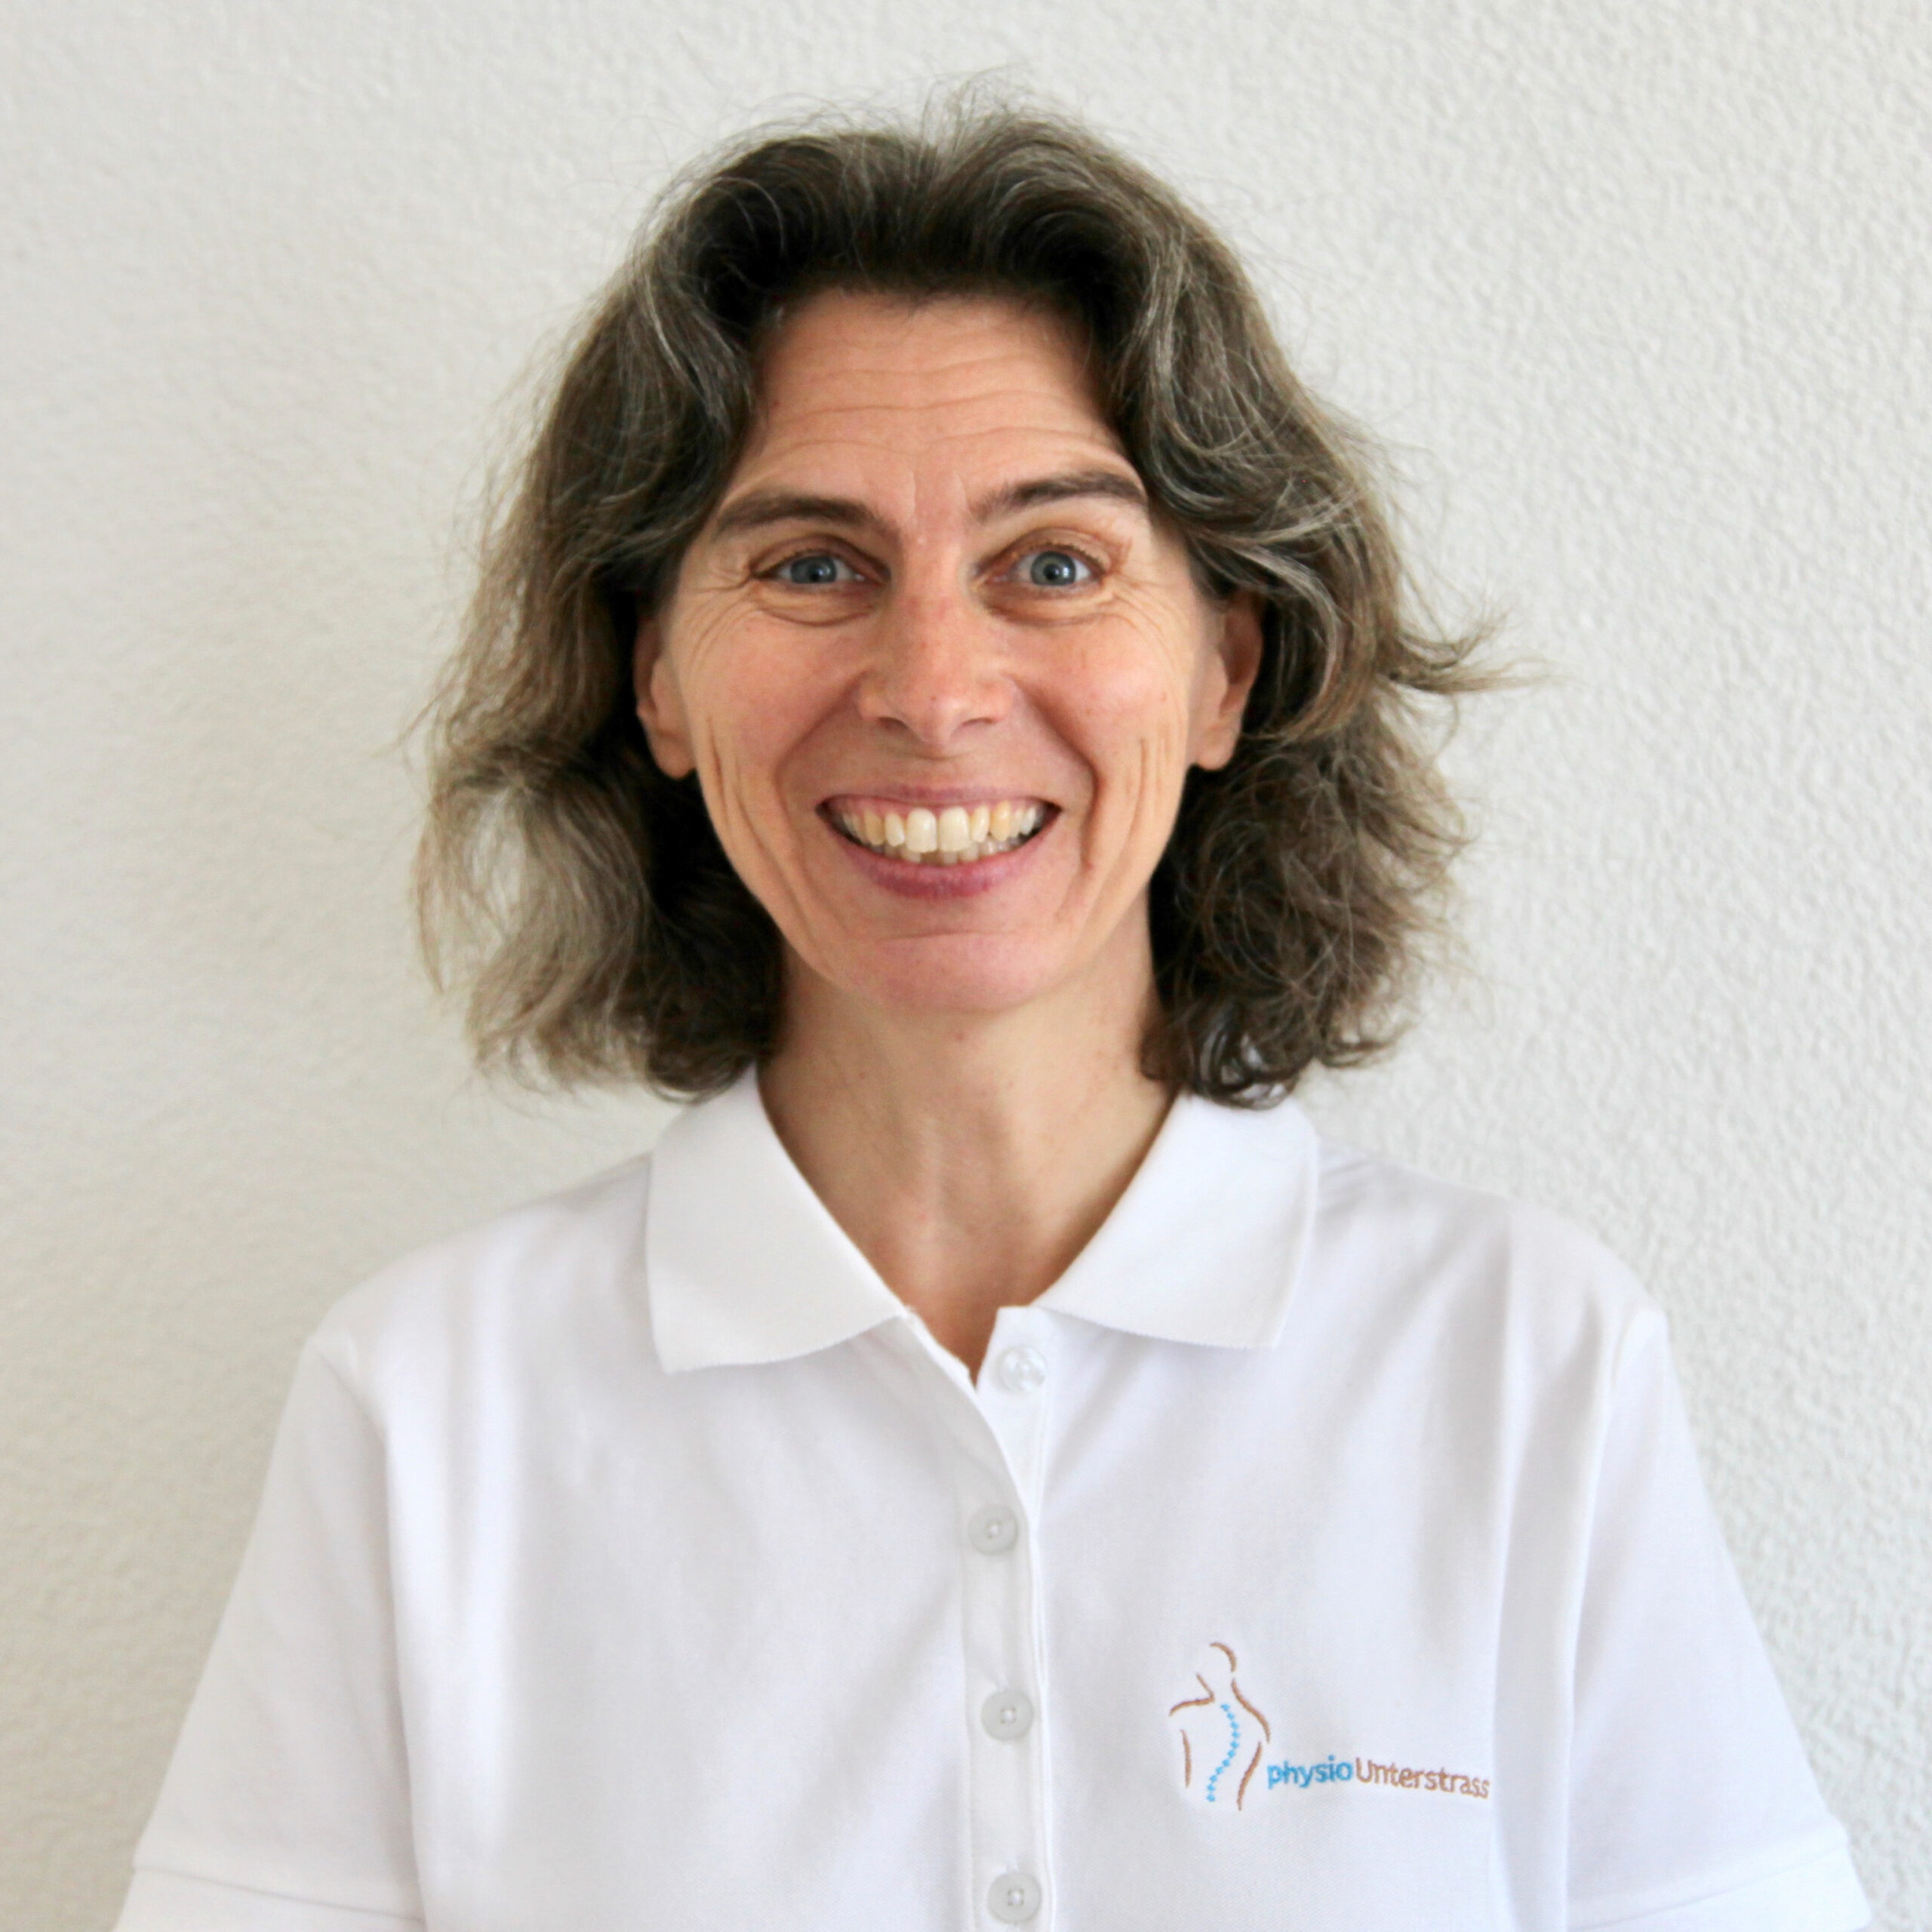 Cornelia Huber-Pfyffer, Physiotherapeutin Zürich, PhysioUnterstrass Zürich